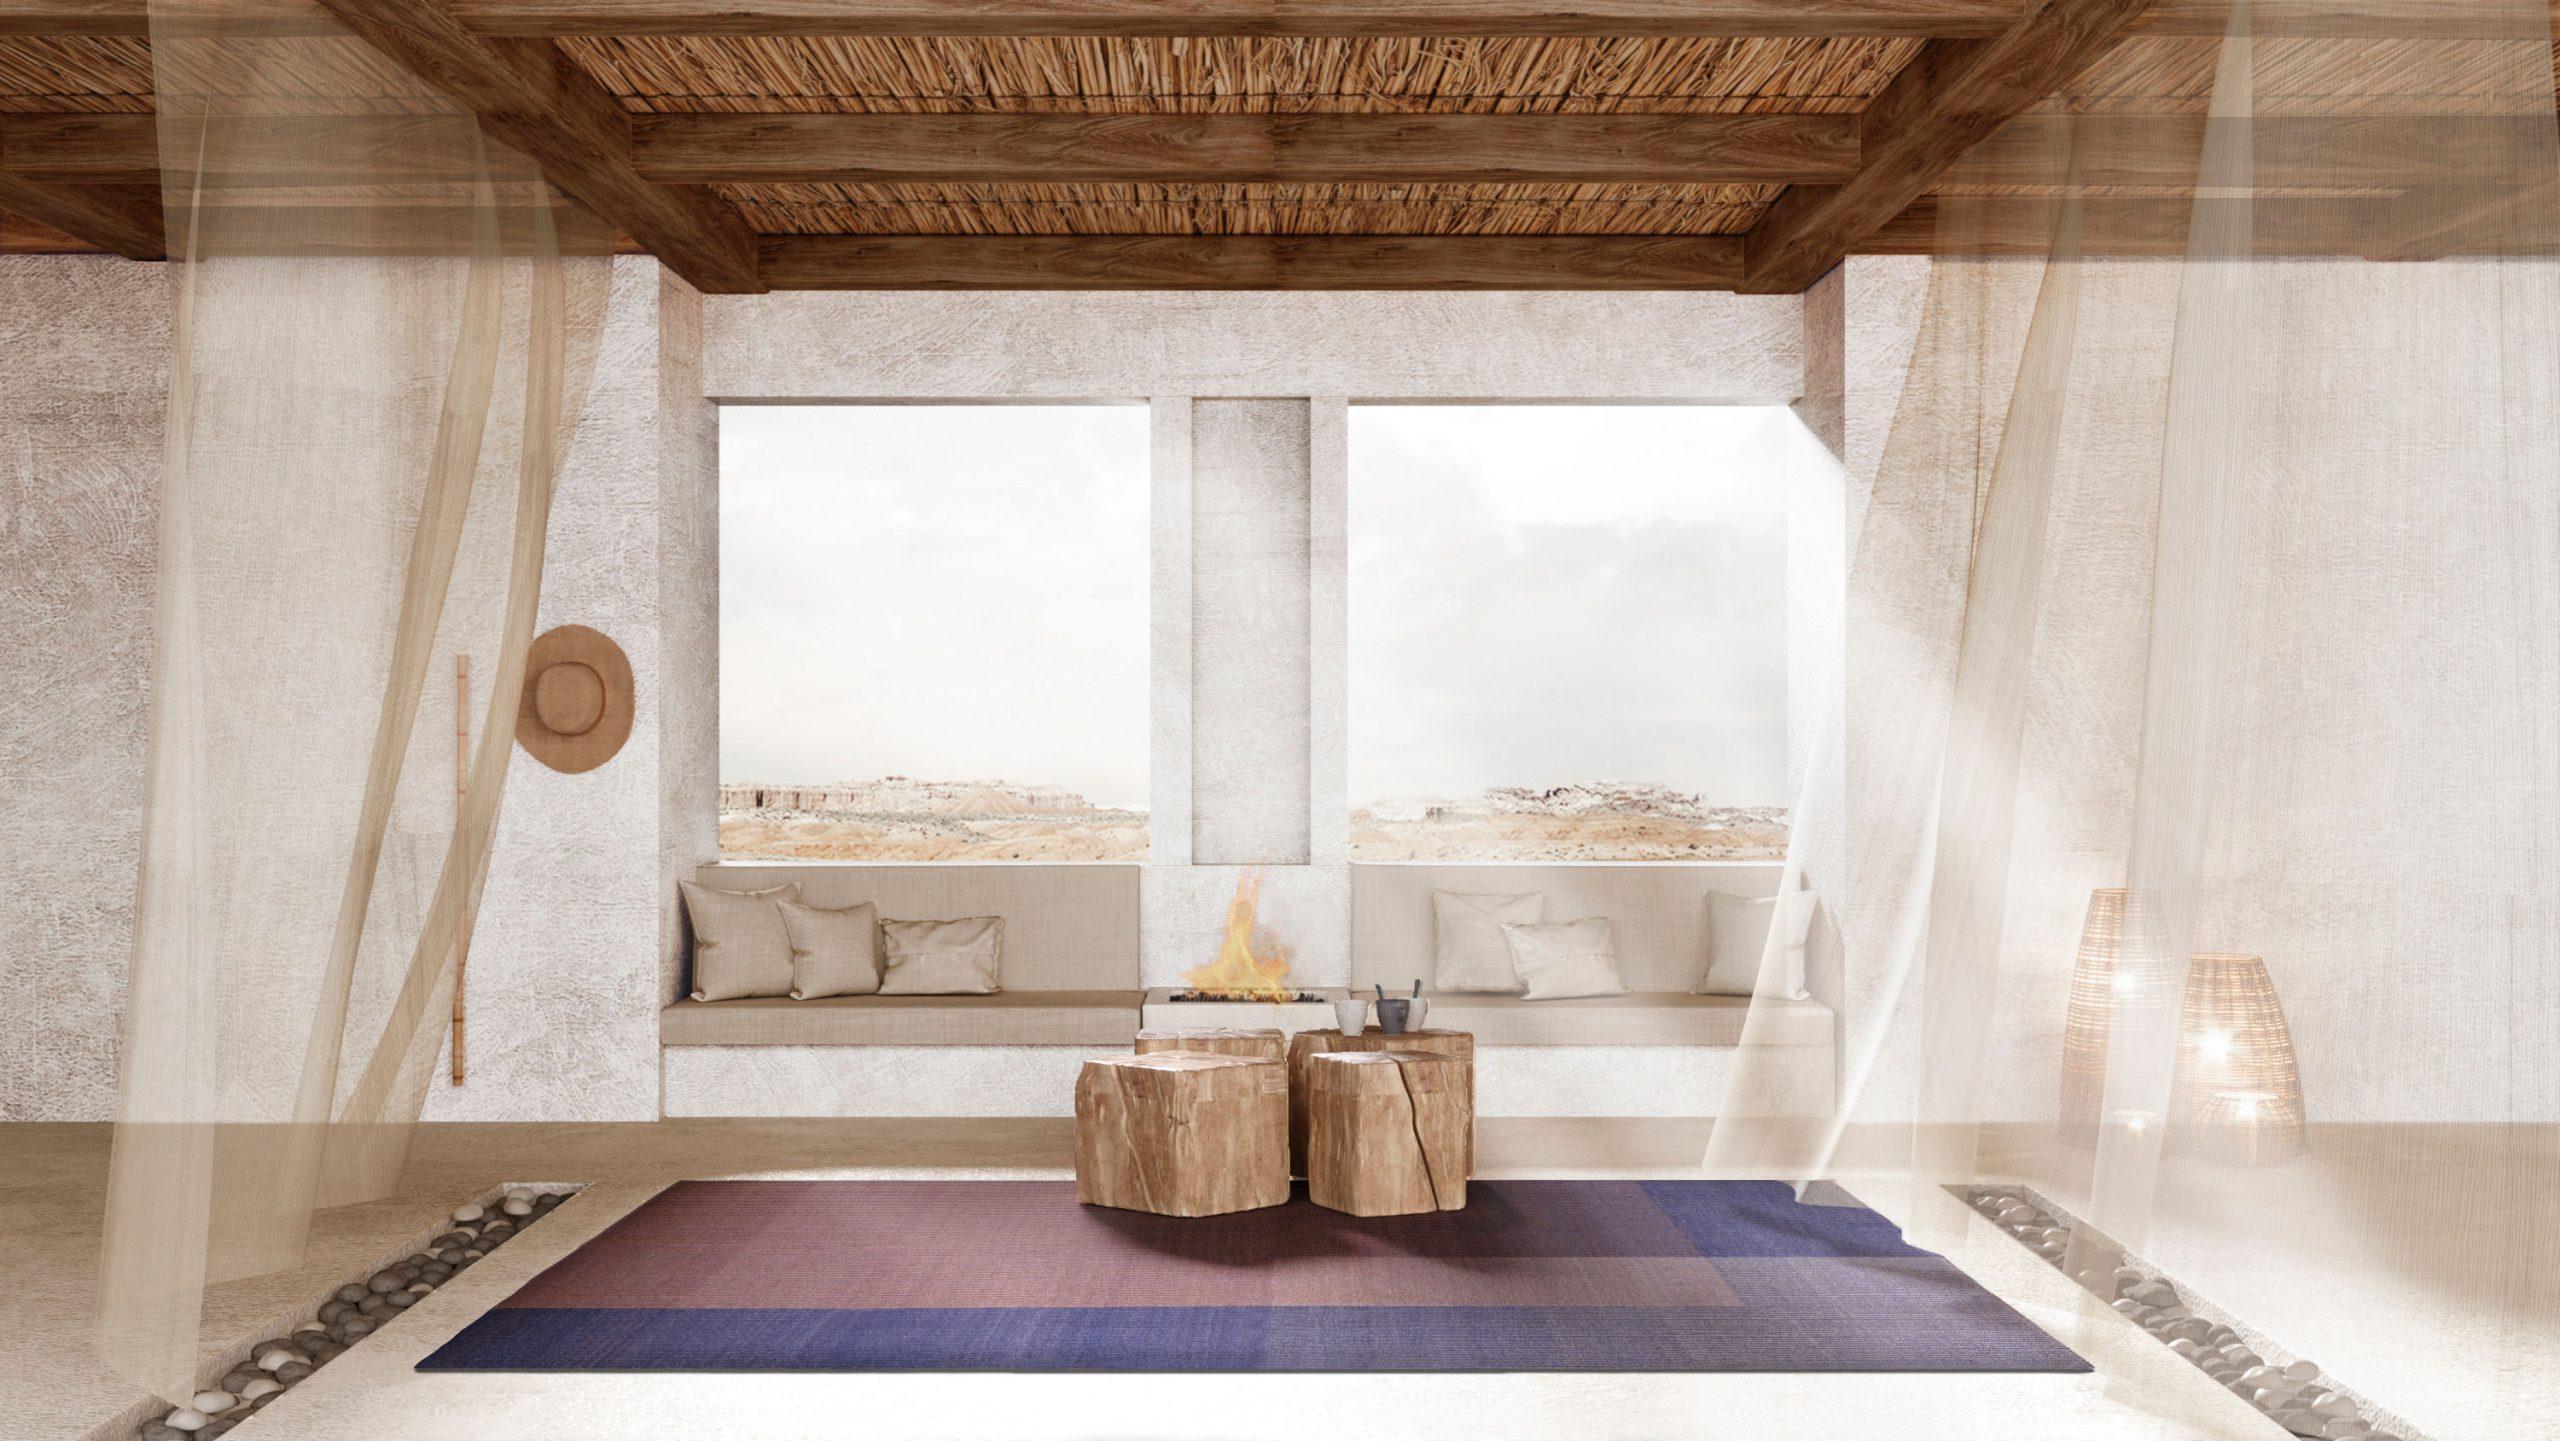 HAZE-begum-cana-ozgur-BelizGorgul-Interiors-UTAH